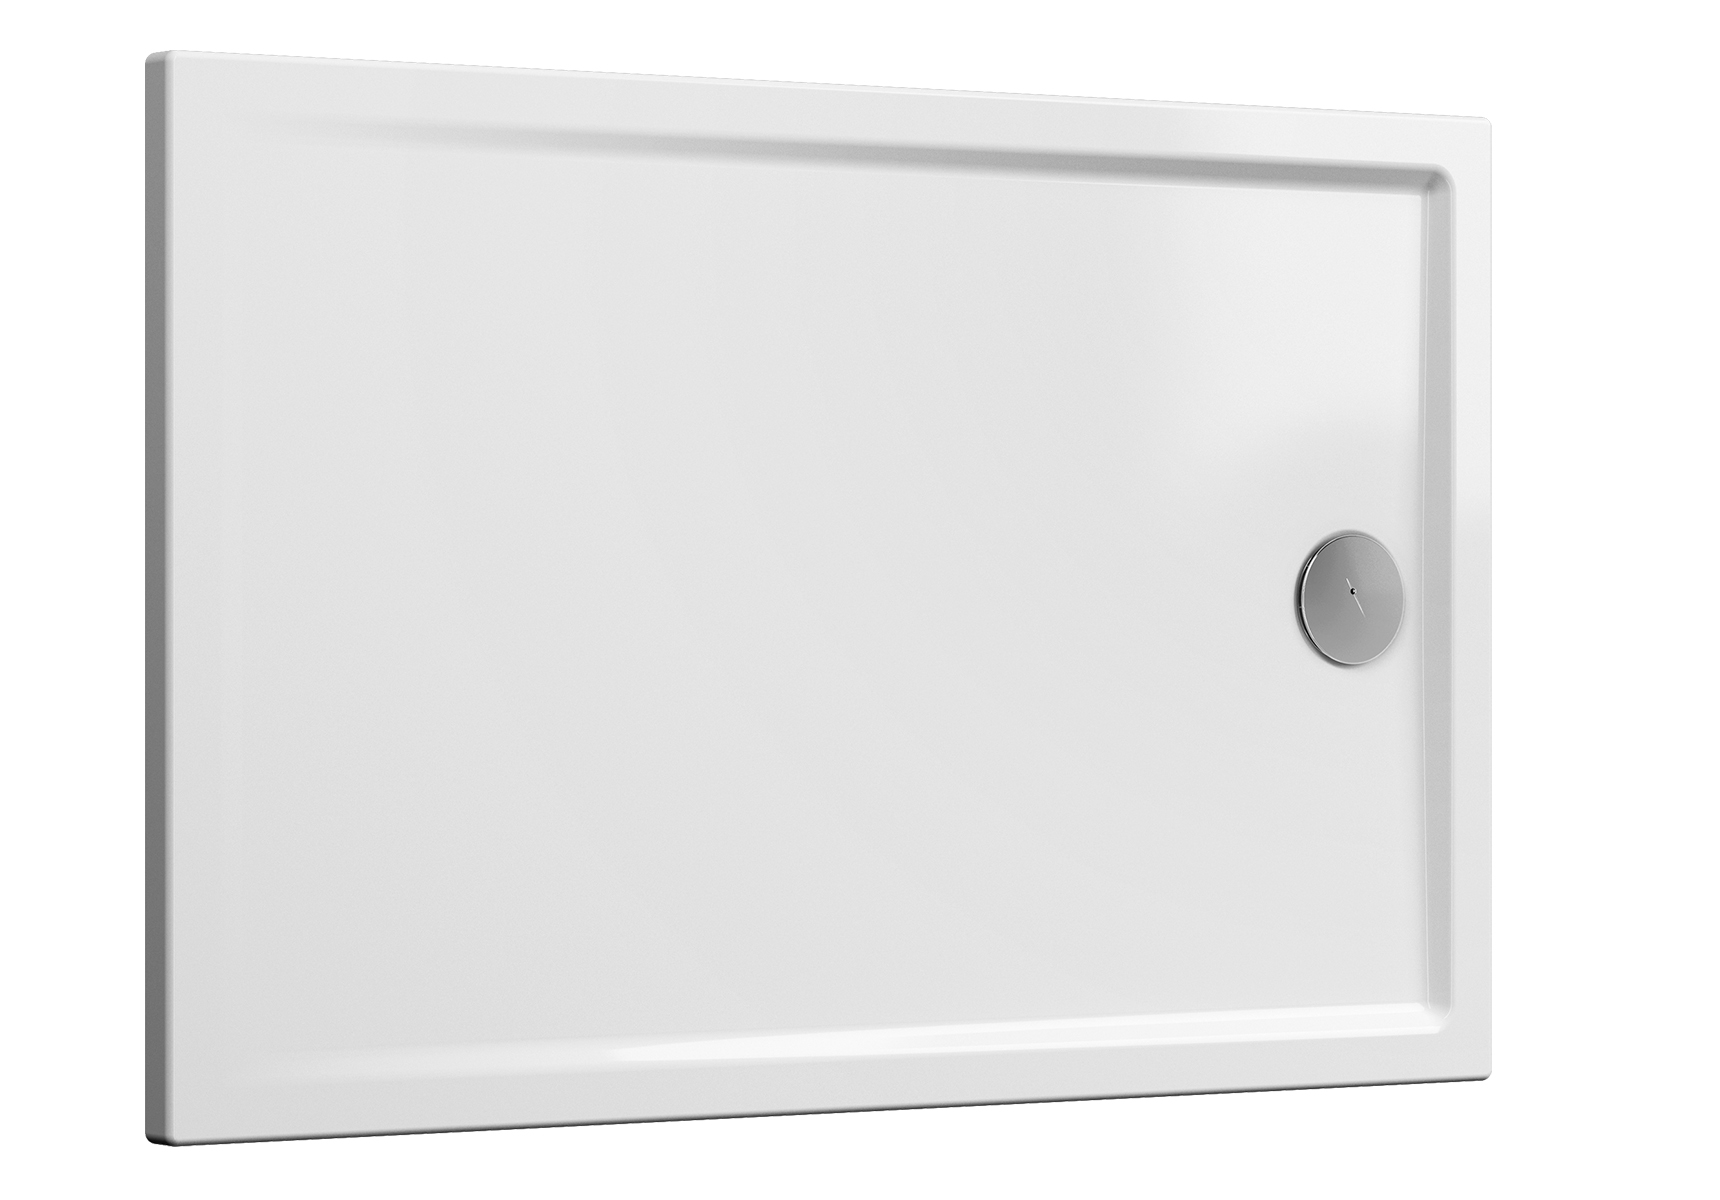 Cascade receveur ultra plat en céramique, 140  x  90 cm, blanc mat